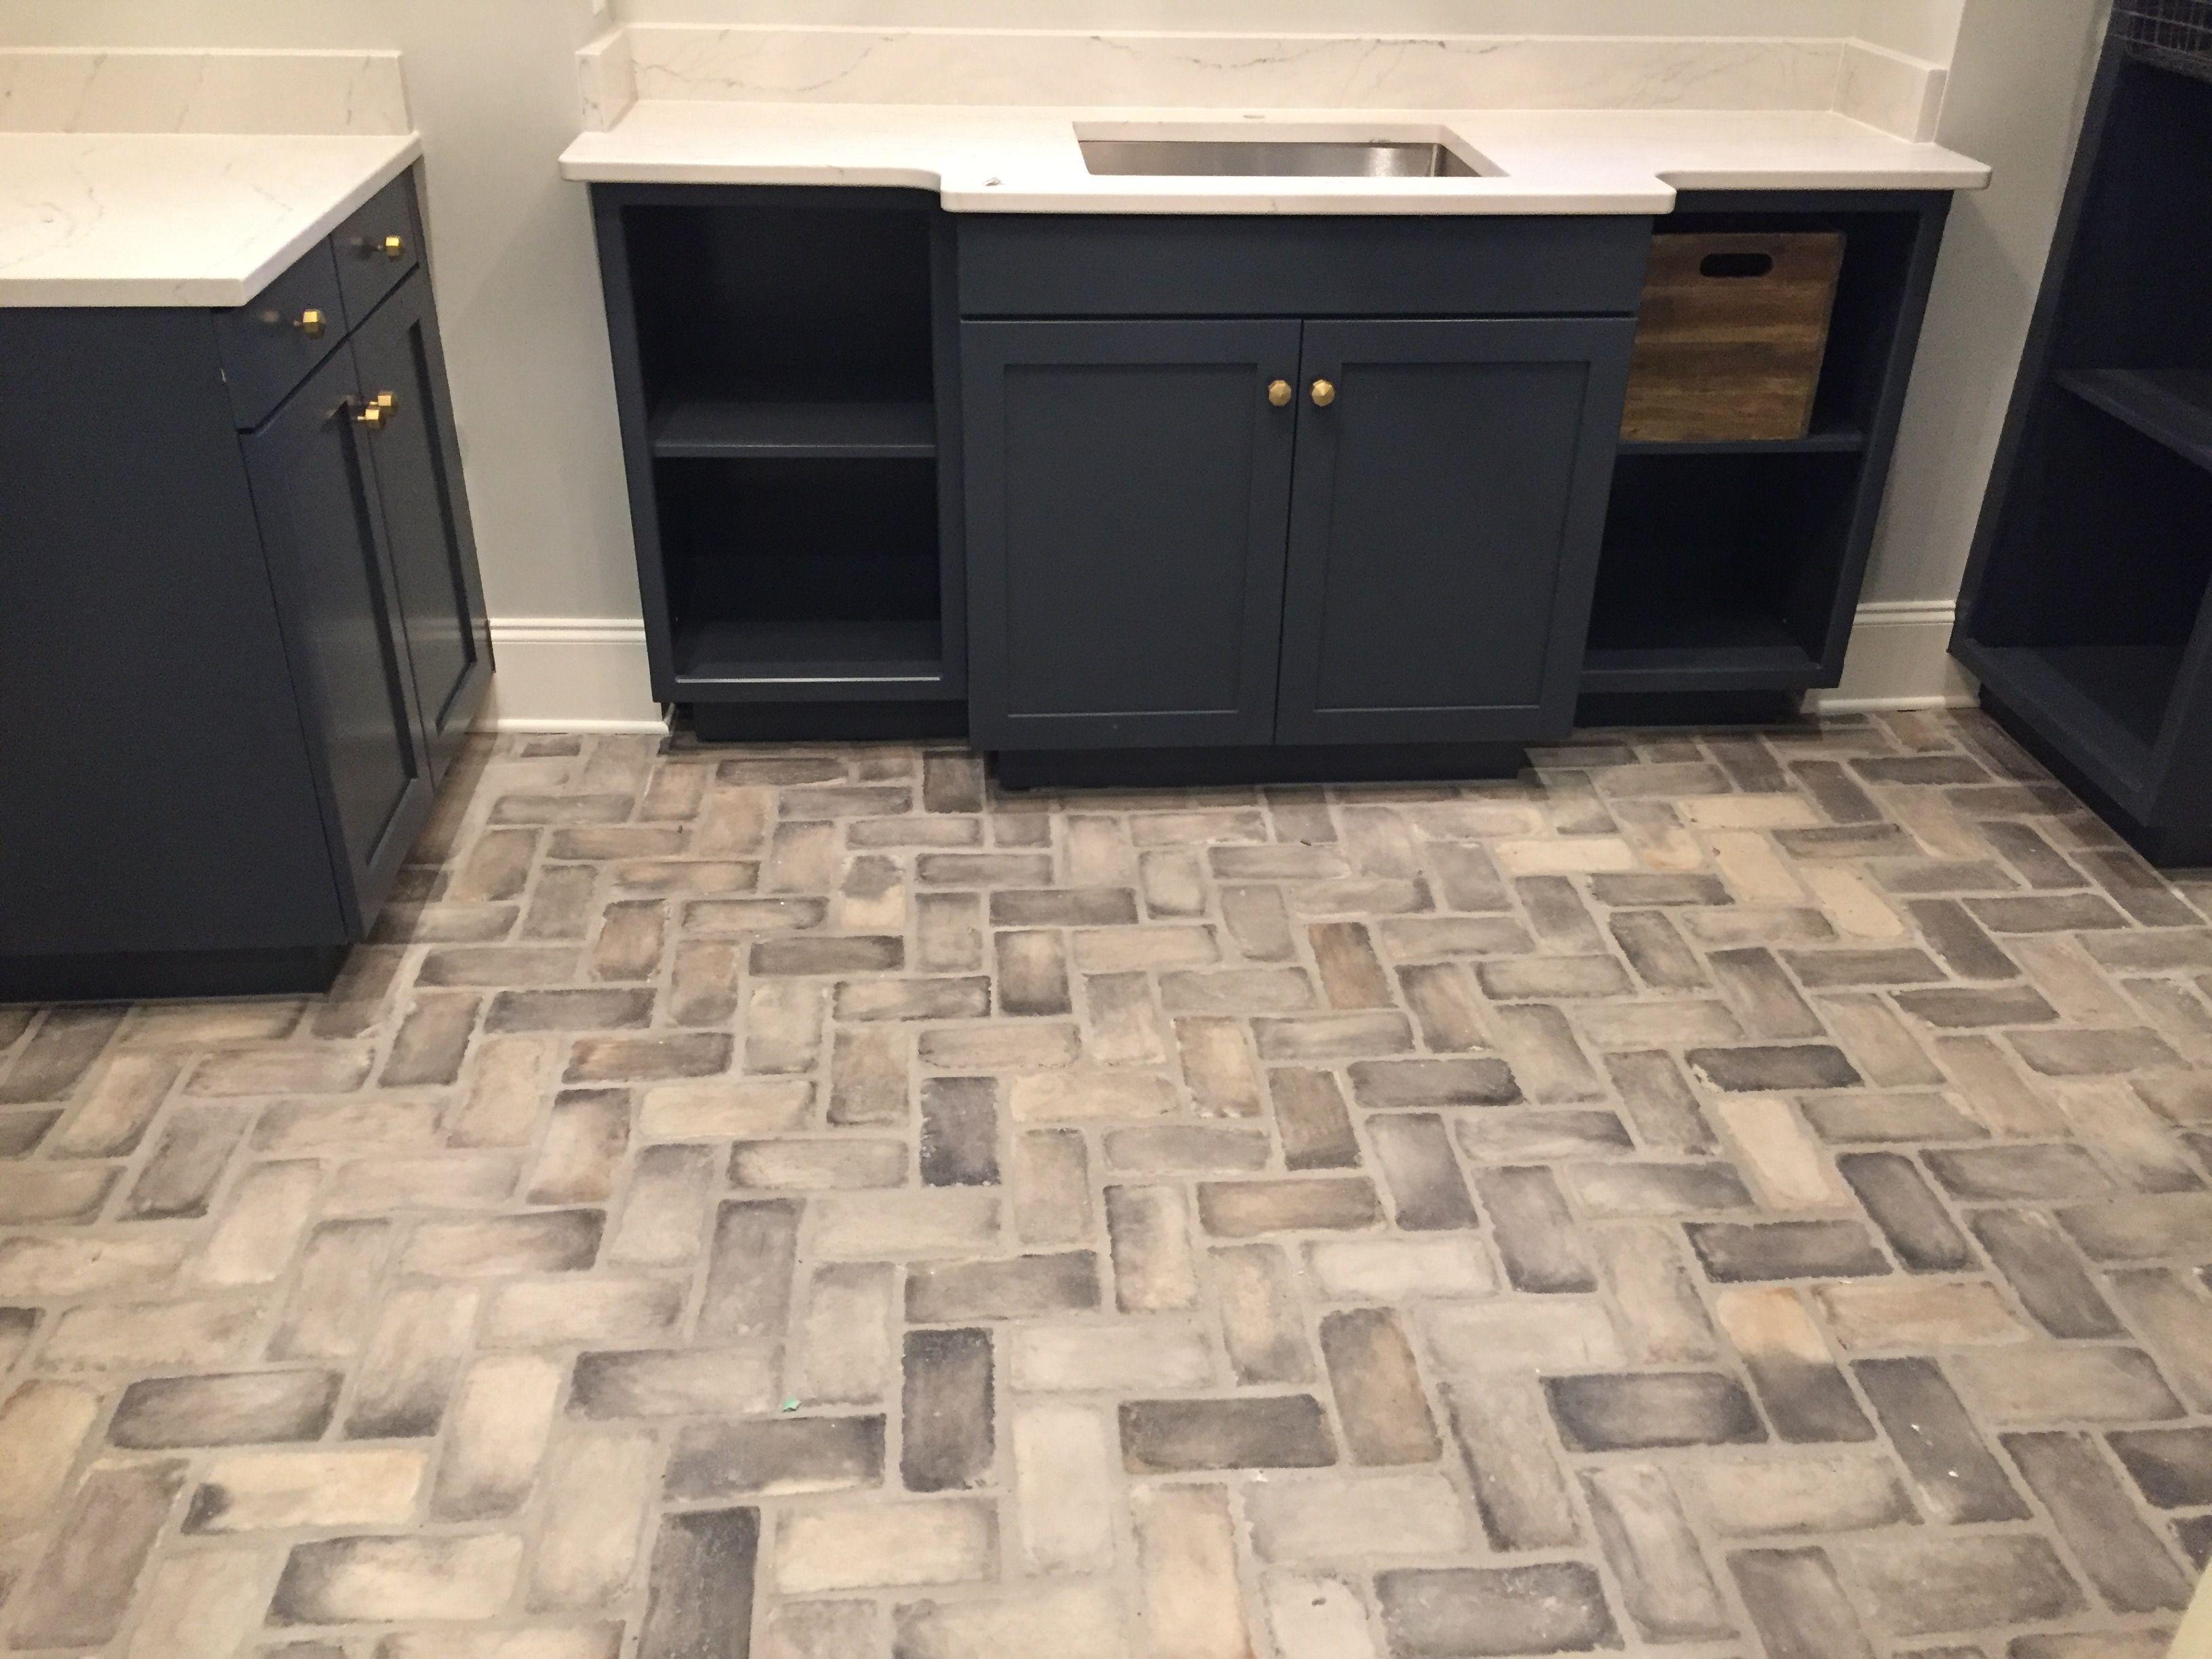 Brick A Floor Burnished Pewter | Kitchen decor, Bathroom ...